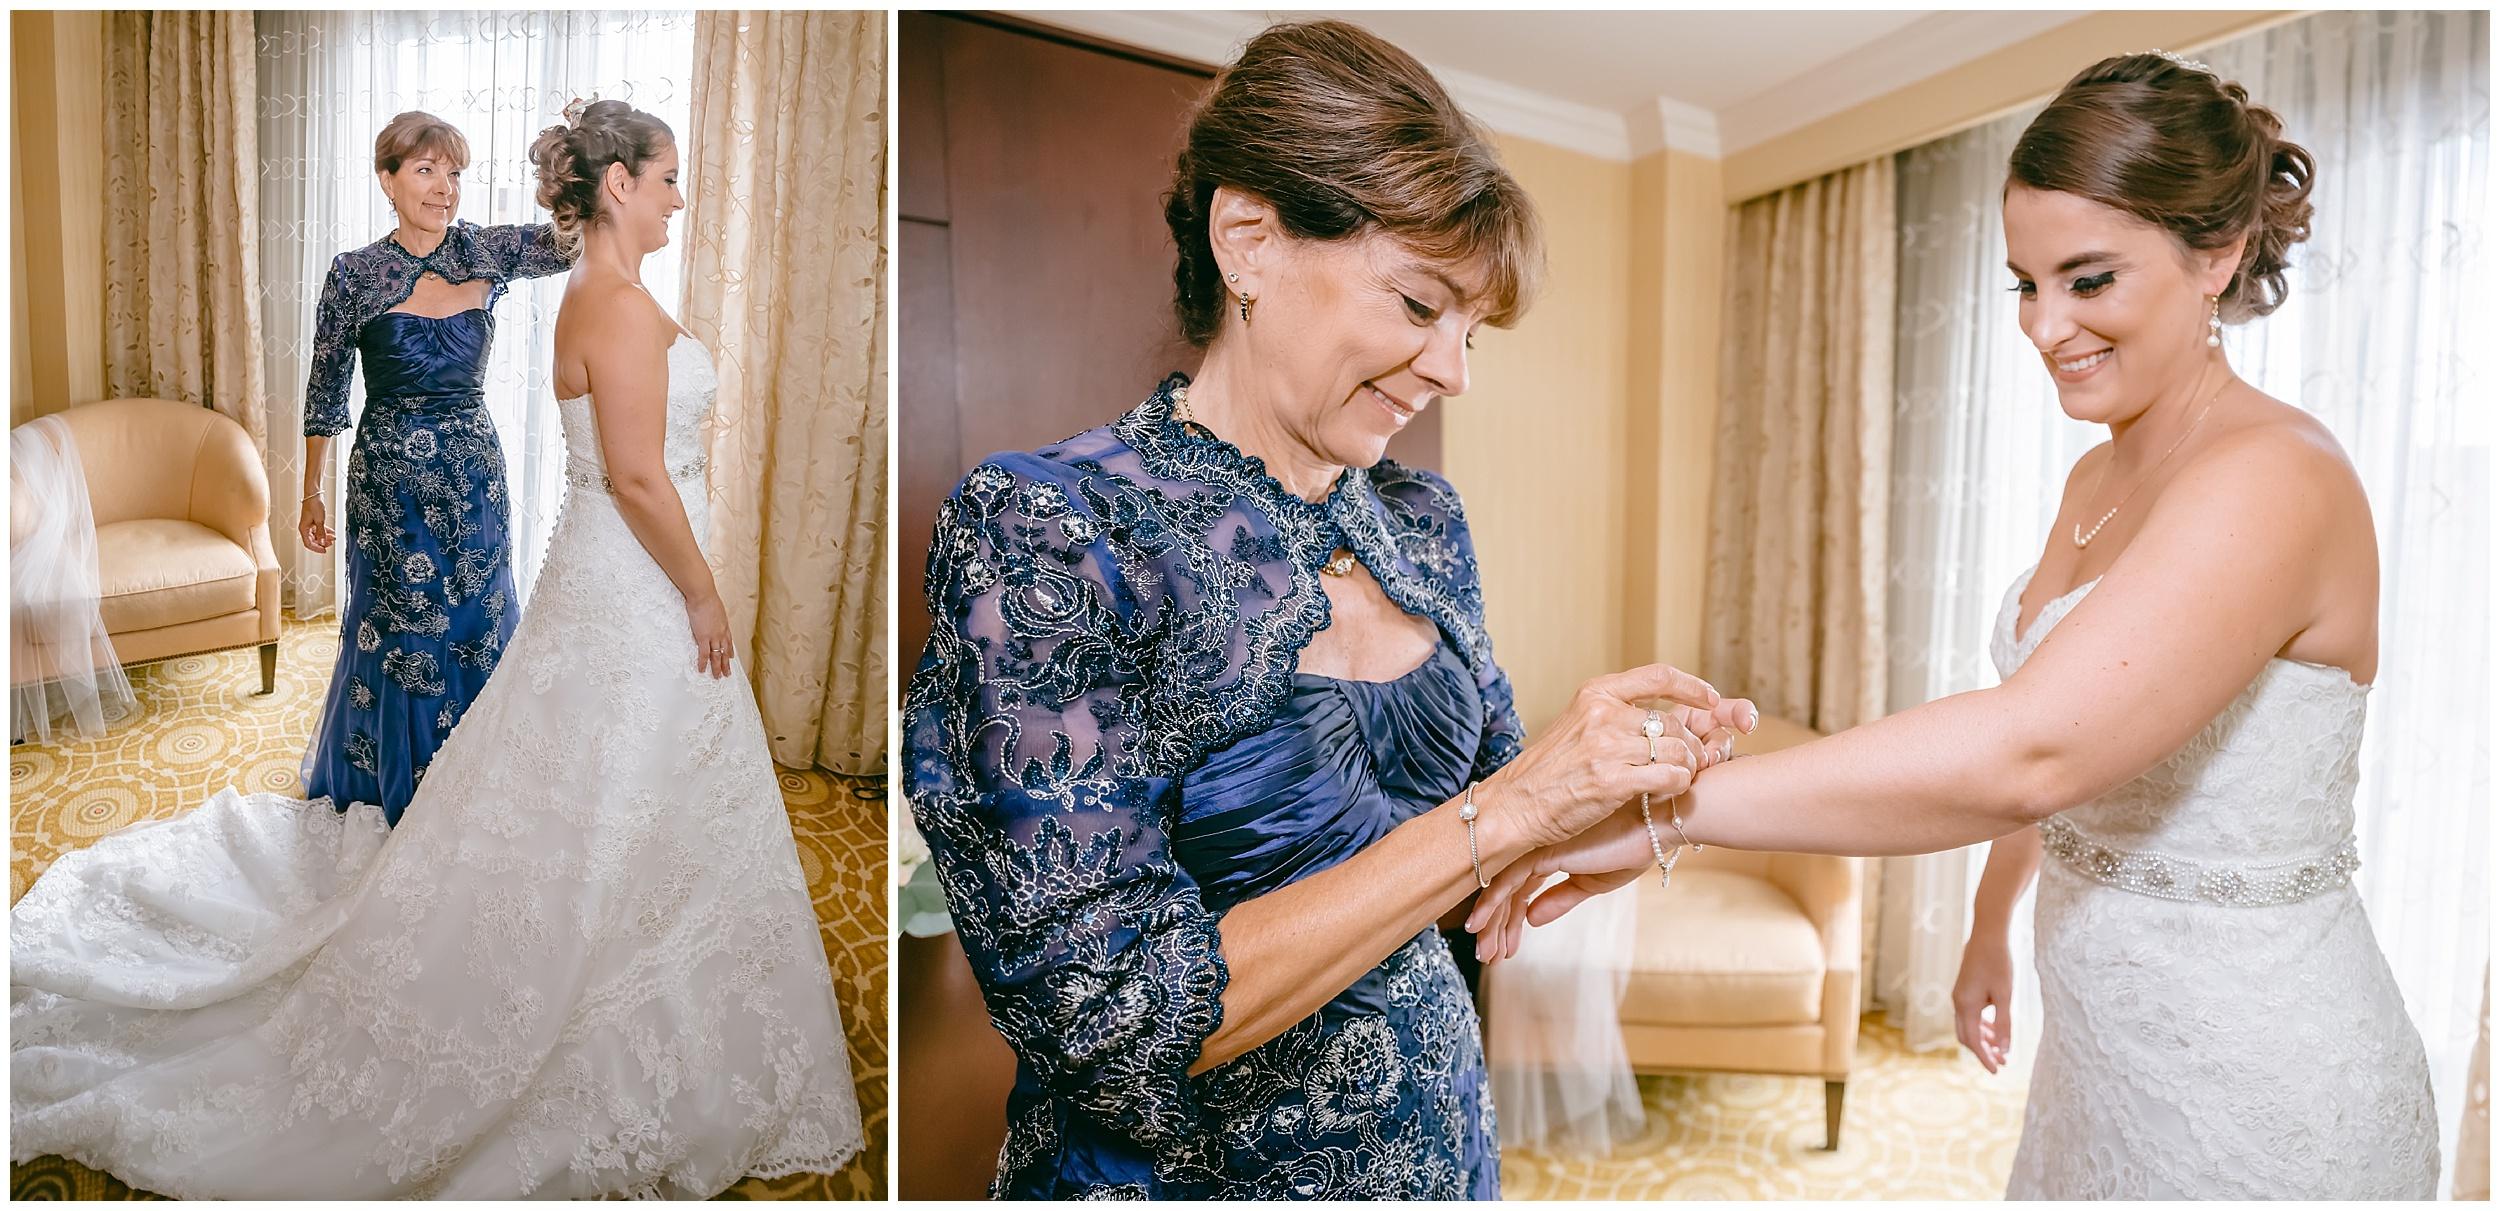 wedding-mother-bride-getting-dressed-washington-dc-photographer